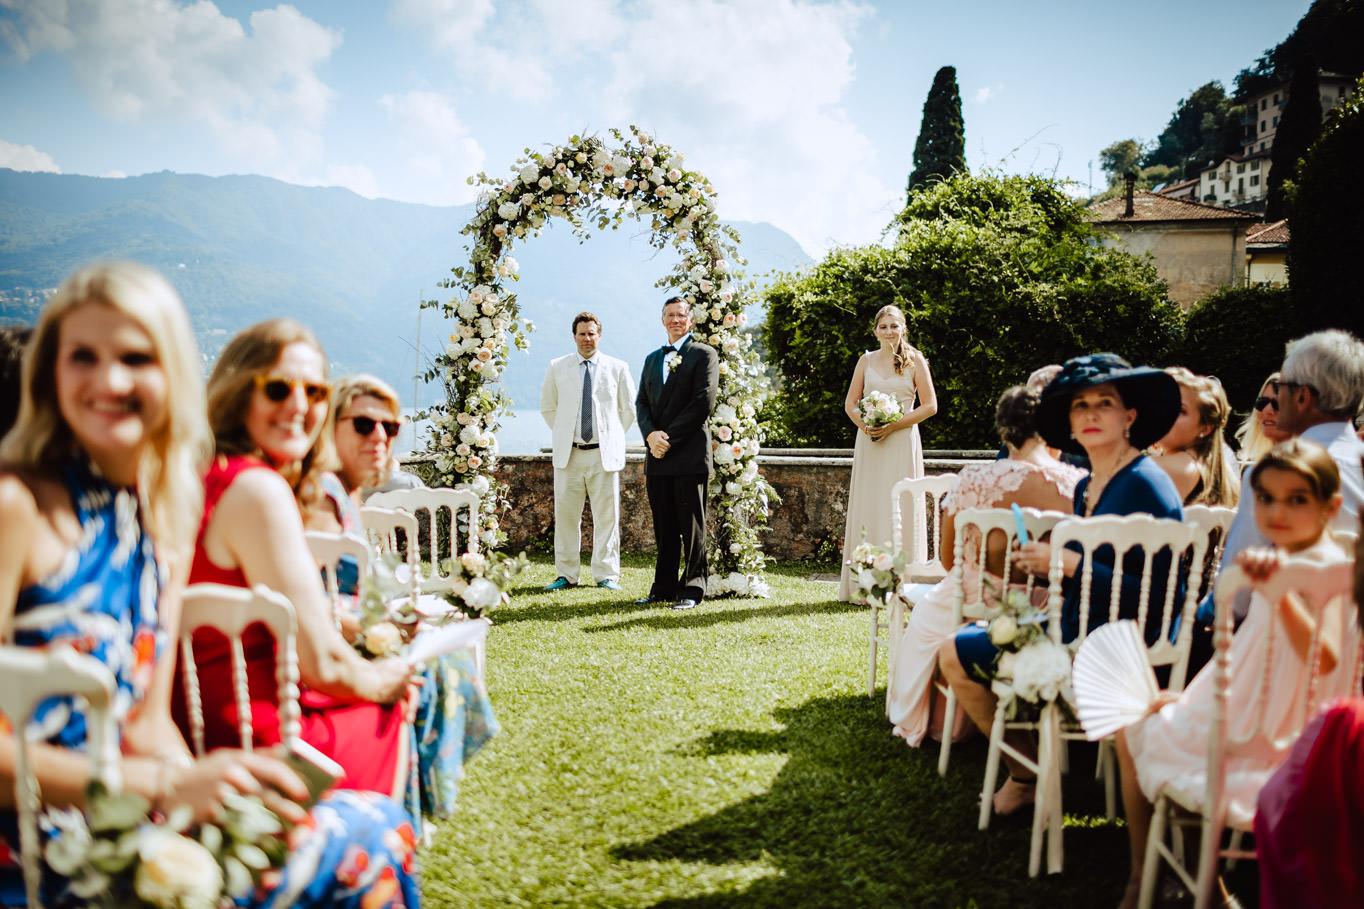 groom waiting for bride at ceremony villa regina teodolinda